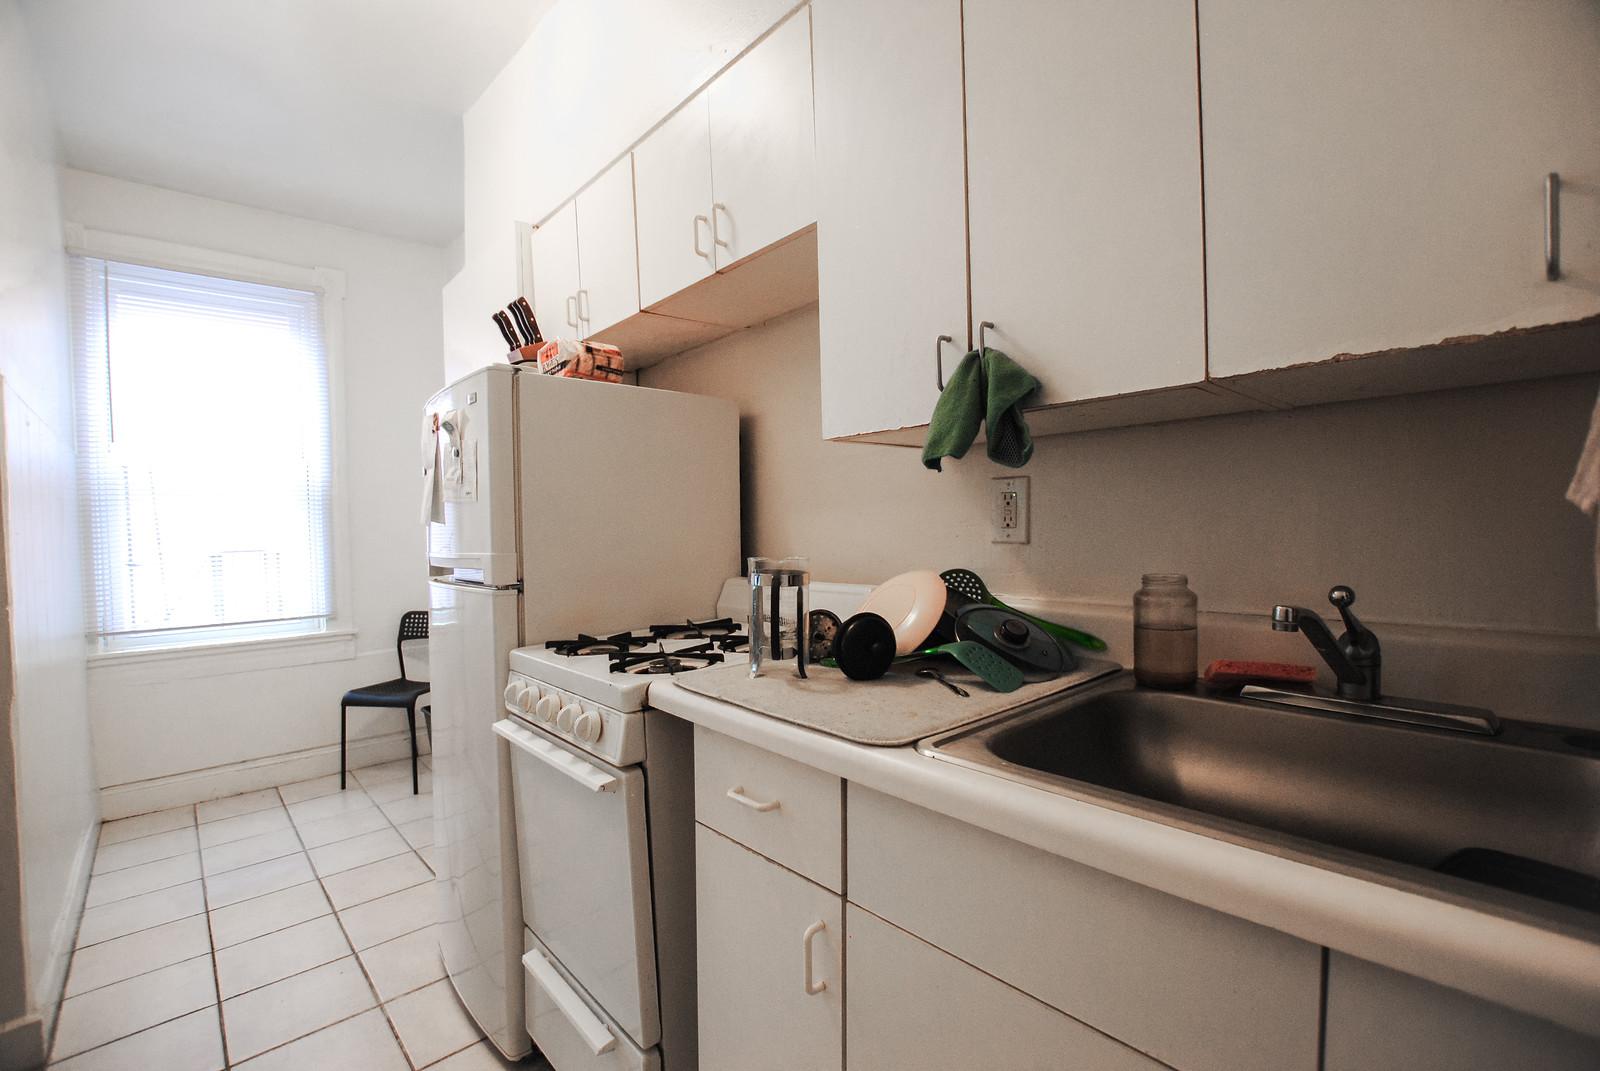 32 Unit 3 kitchen